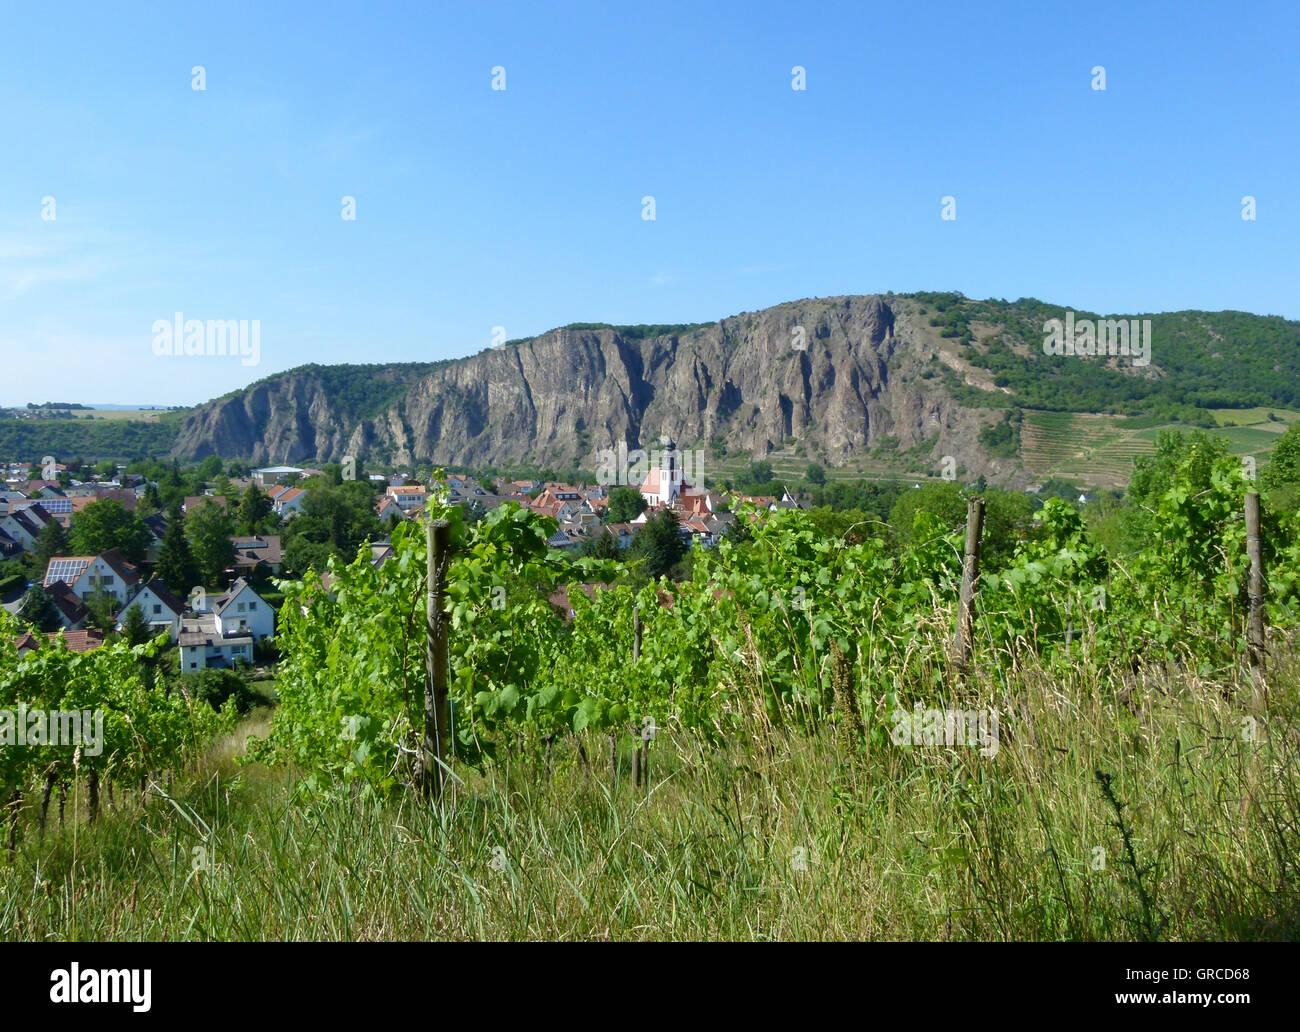 Idyllical Bad Muenster Am Stein, Rhineland-Palatinate - Stock Image